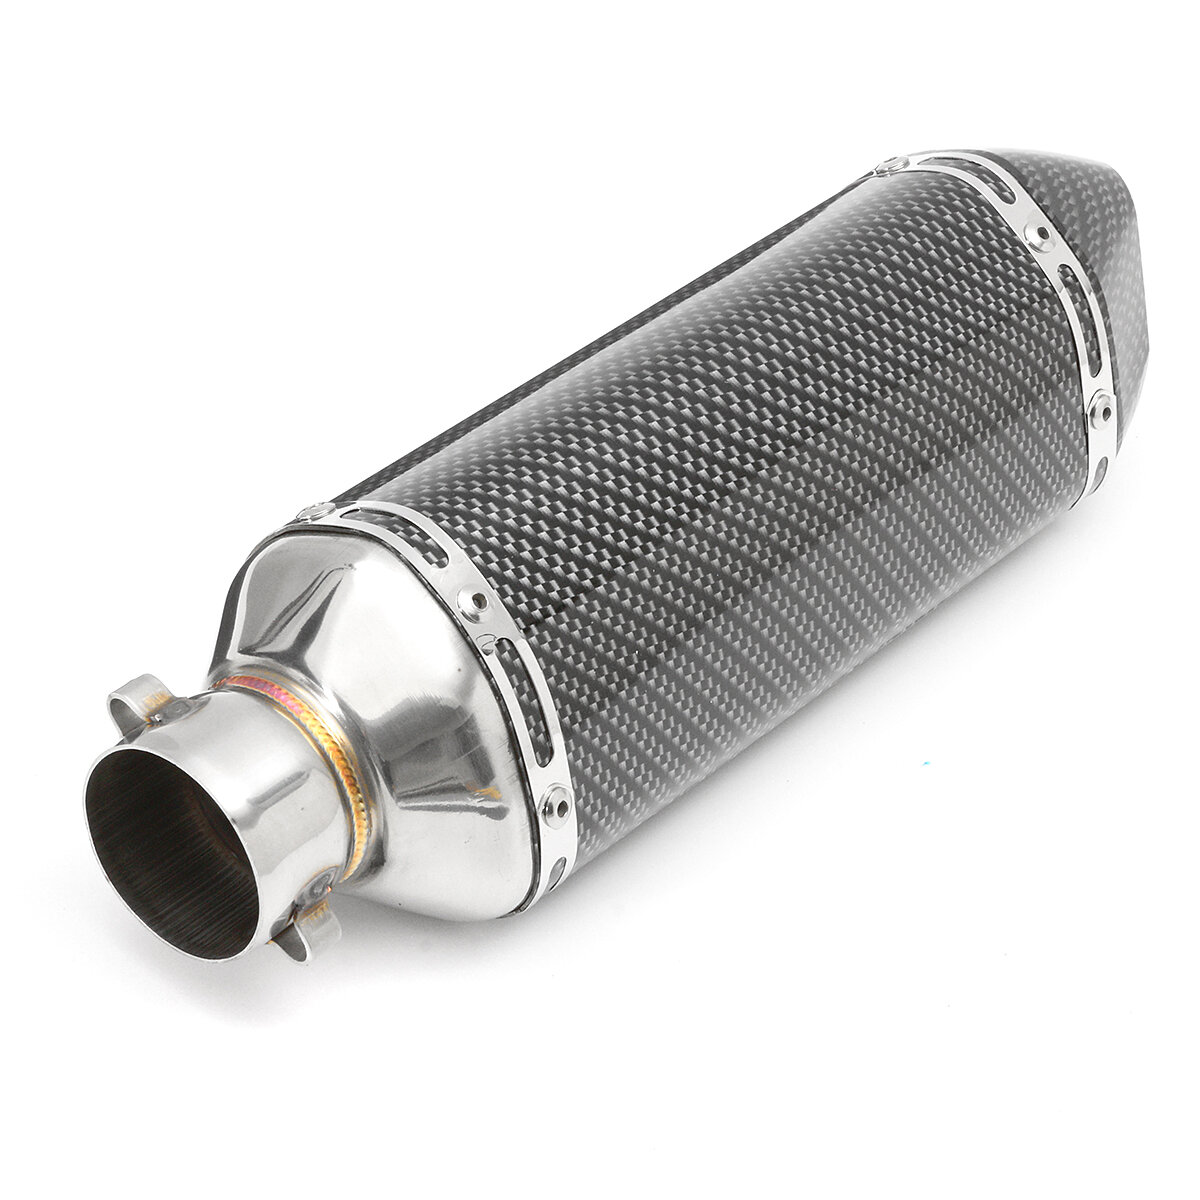 Mufflers For Sale >> 51mm Universal Exhaust Mufflers For Dirt Street Bike Motorcycle